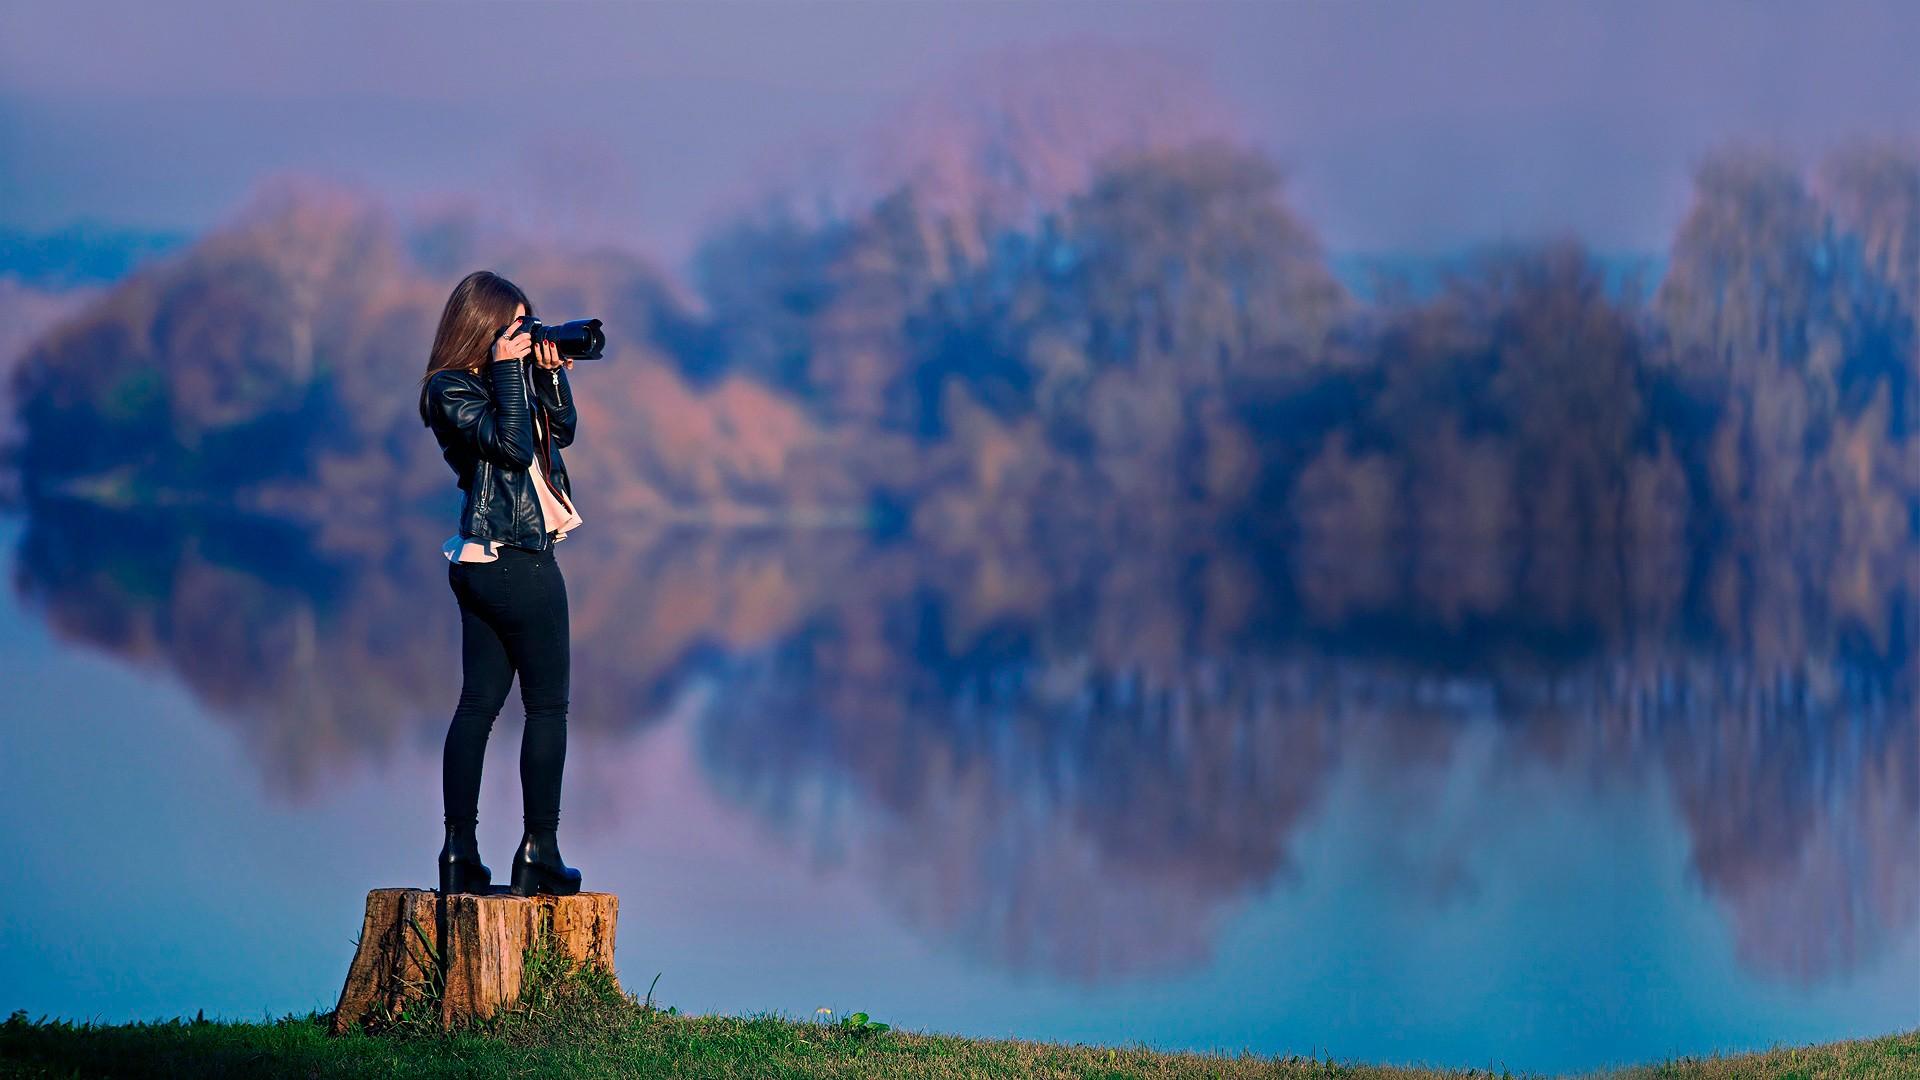 Wallpaper : sunlight, trees, mountains, Photoshop, birds